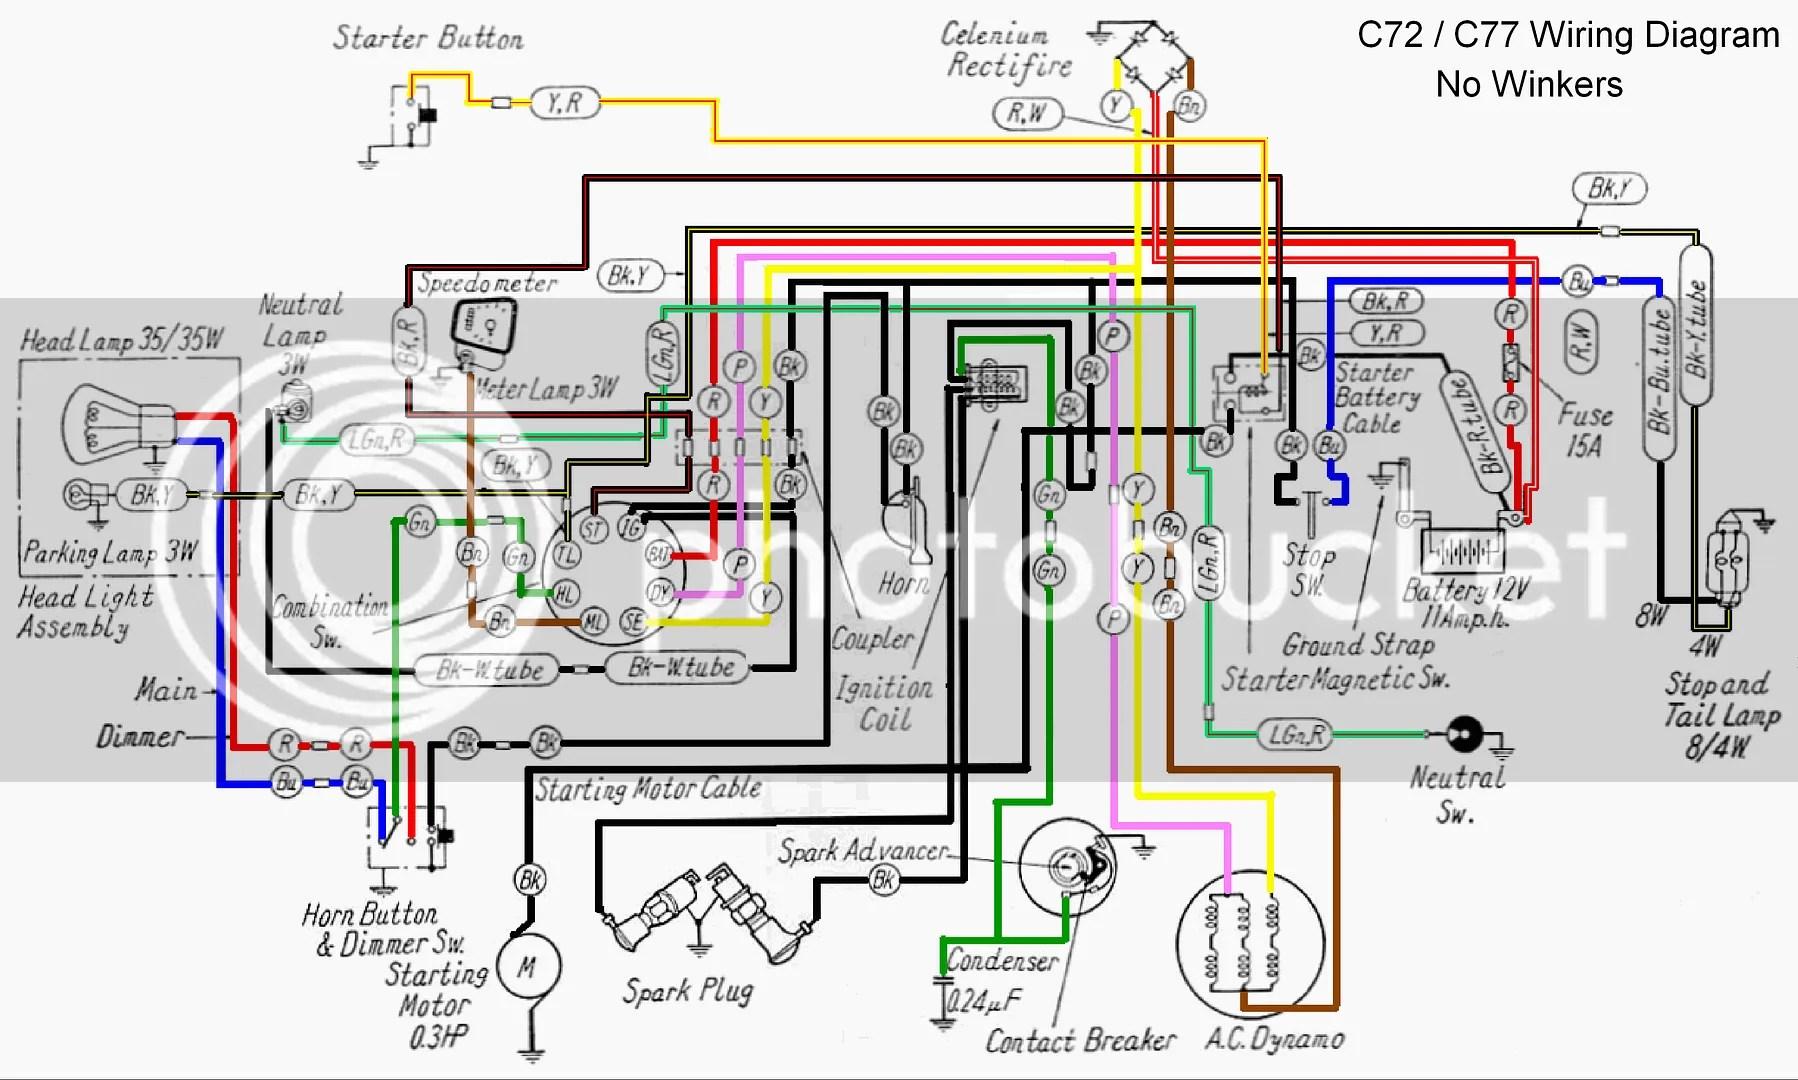 Wiring Diagram Honda Cl70 - 2016 honda civic wire harness ... on